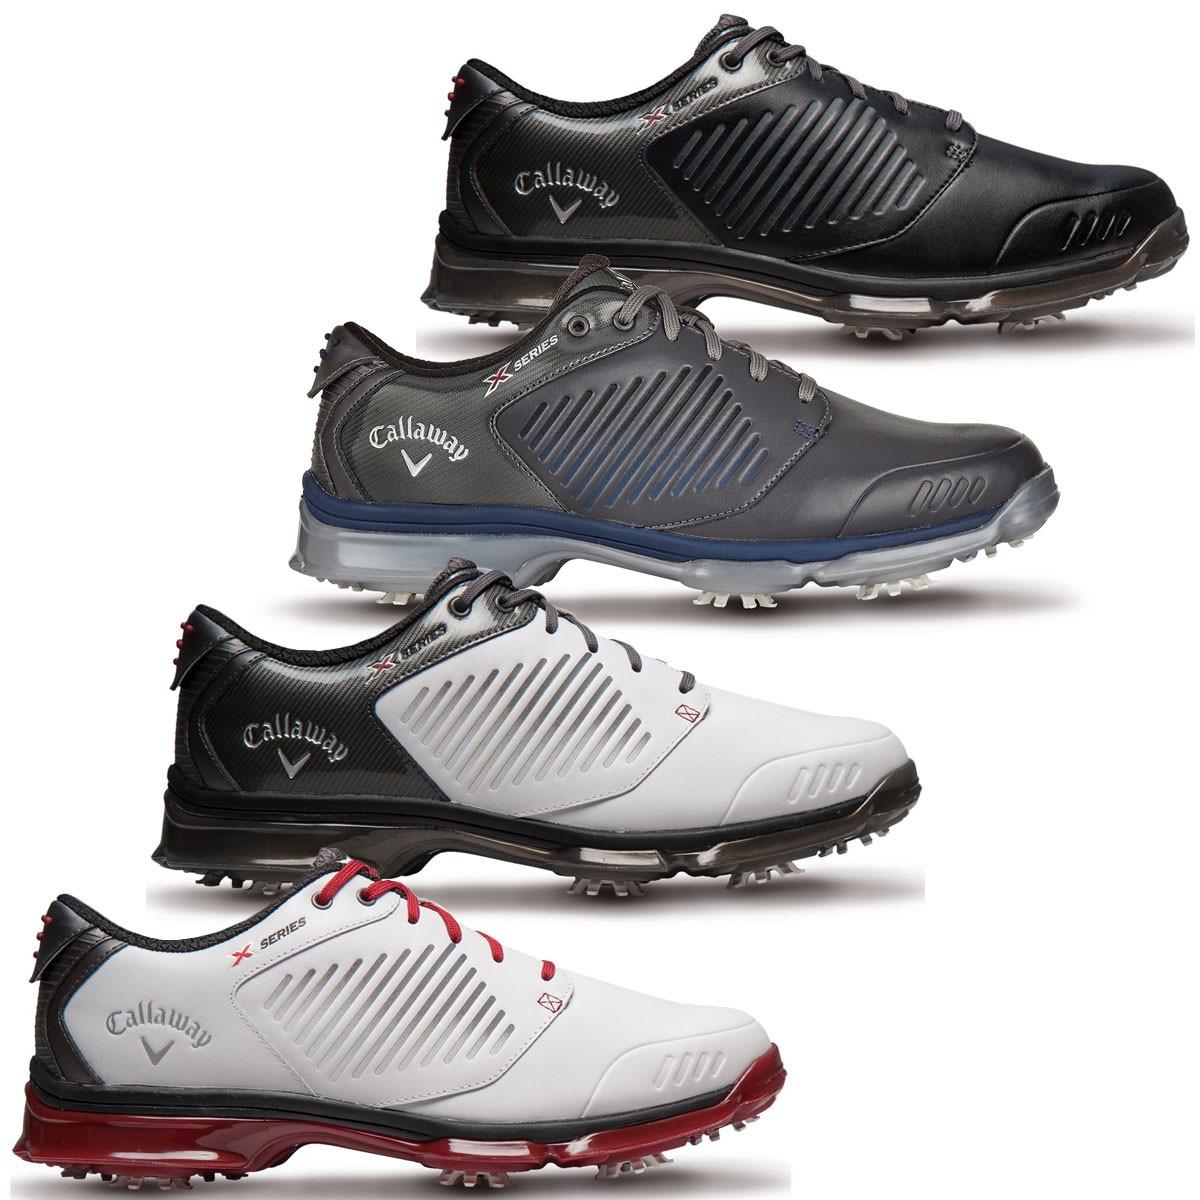 ergonomic chair joe rogan christmas covers canada callaway golf shoes 2019